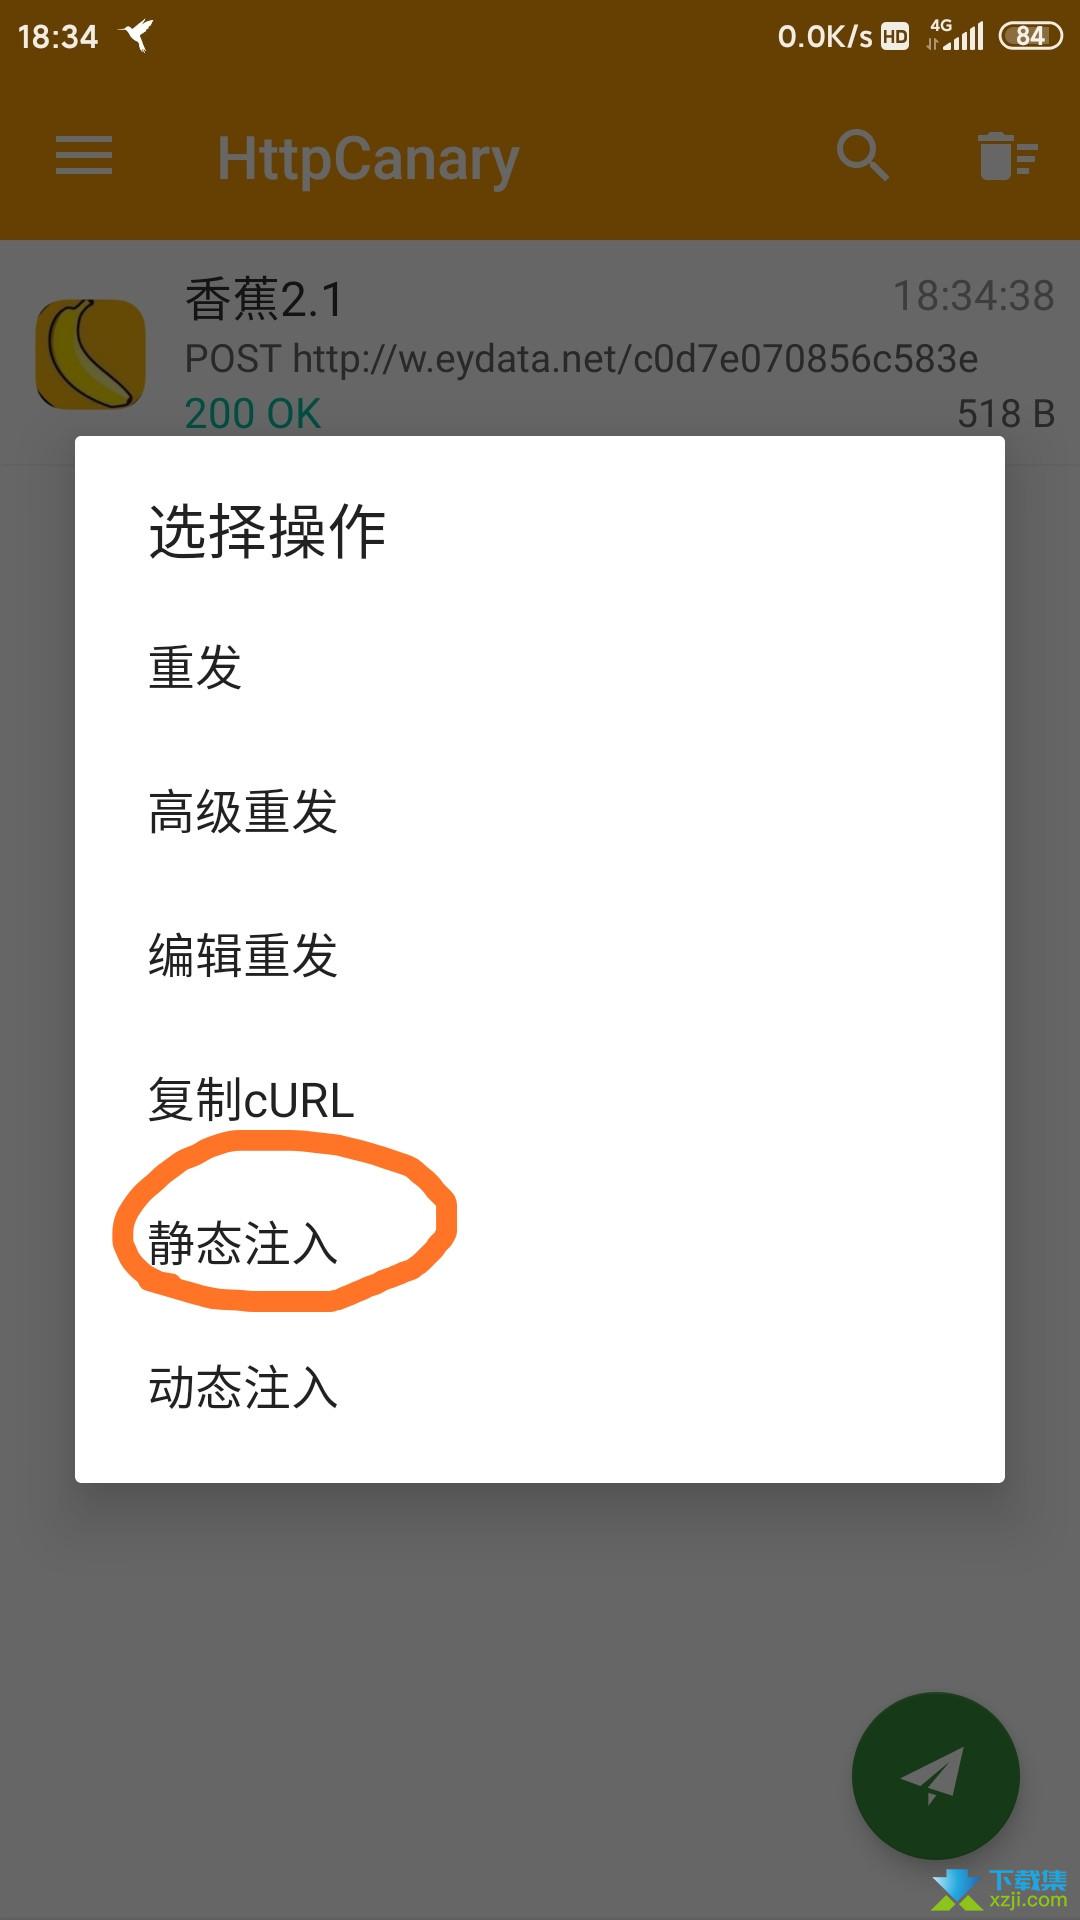 HttpCanary手机抓包工具实战教程介绍